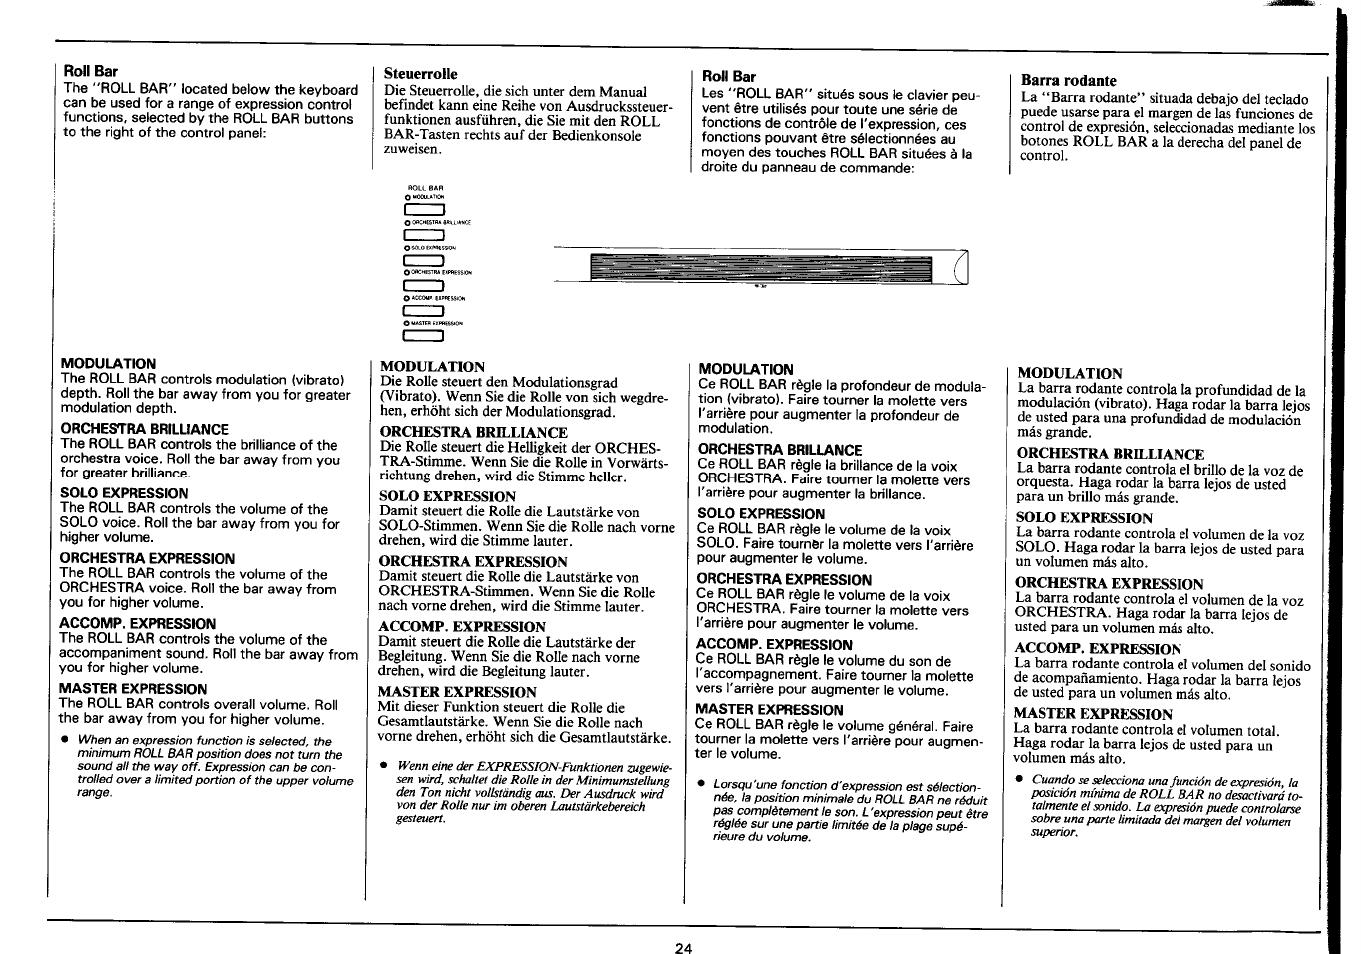 4500 Owners Manual Jayco Skylark Fuse Box Location Array Roll Bar Steuerrolle Yamaha Psr User Page 26 48 Rh Manualsdir Com